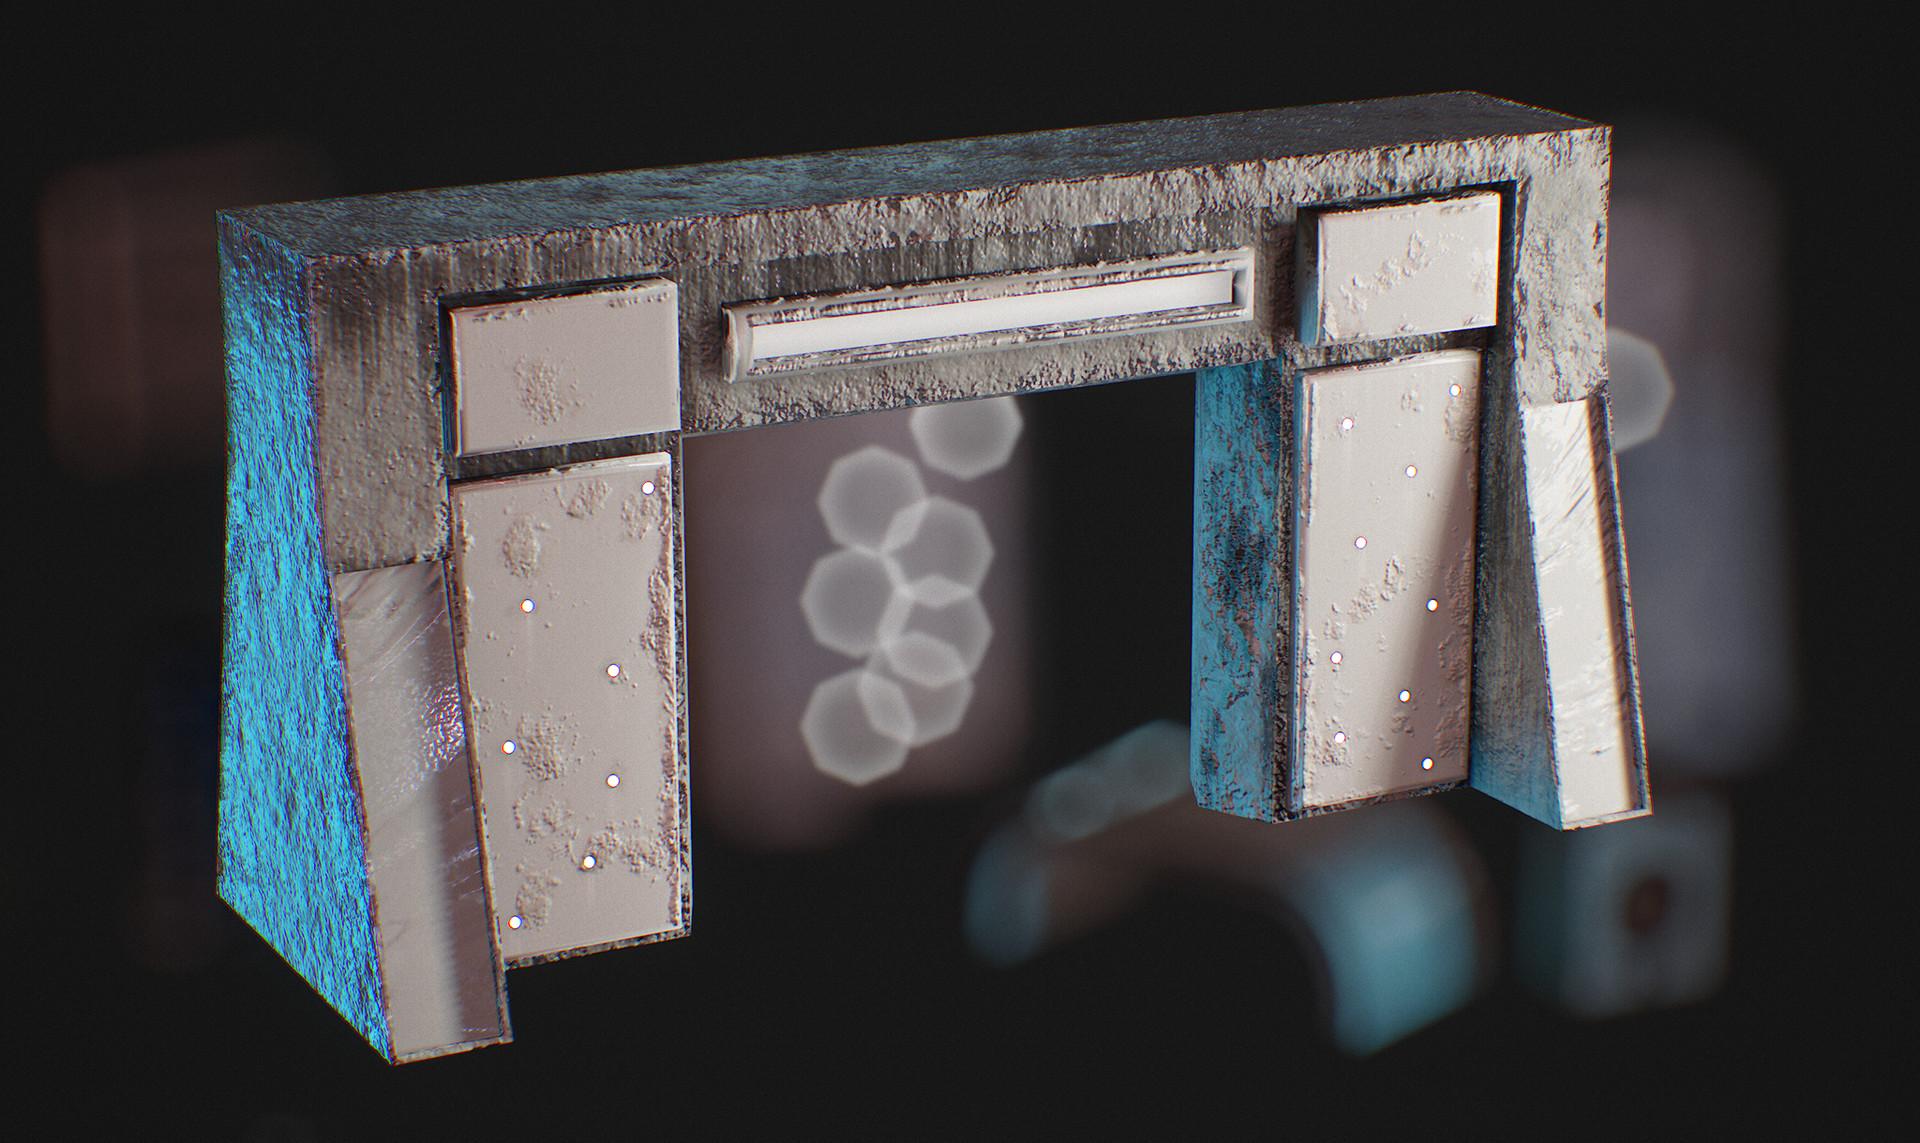 Hannu koivuranta asset doorway detail